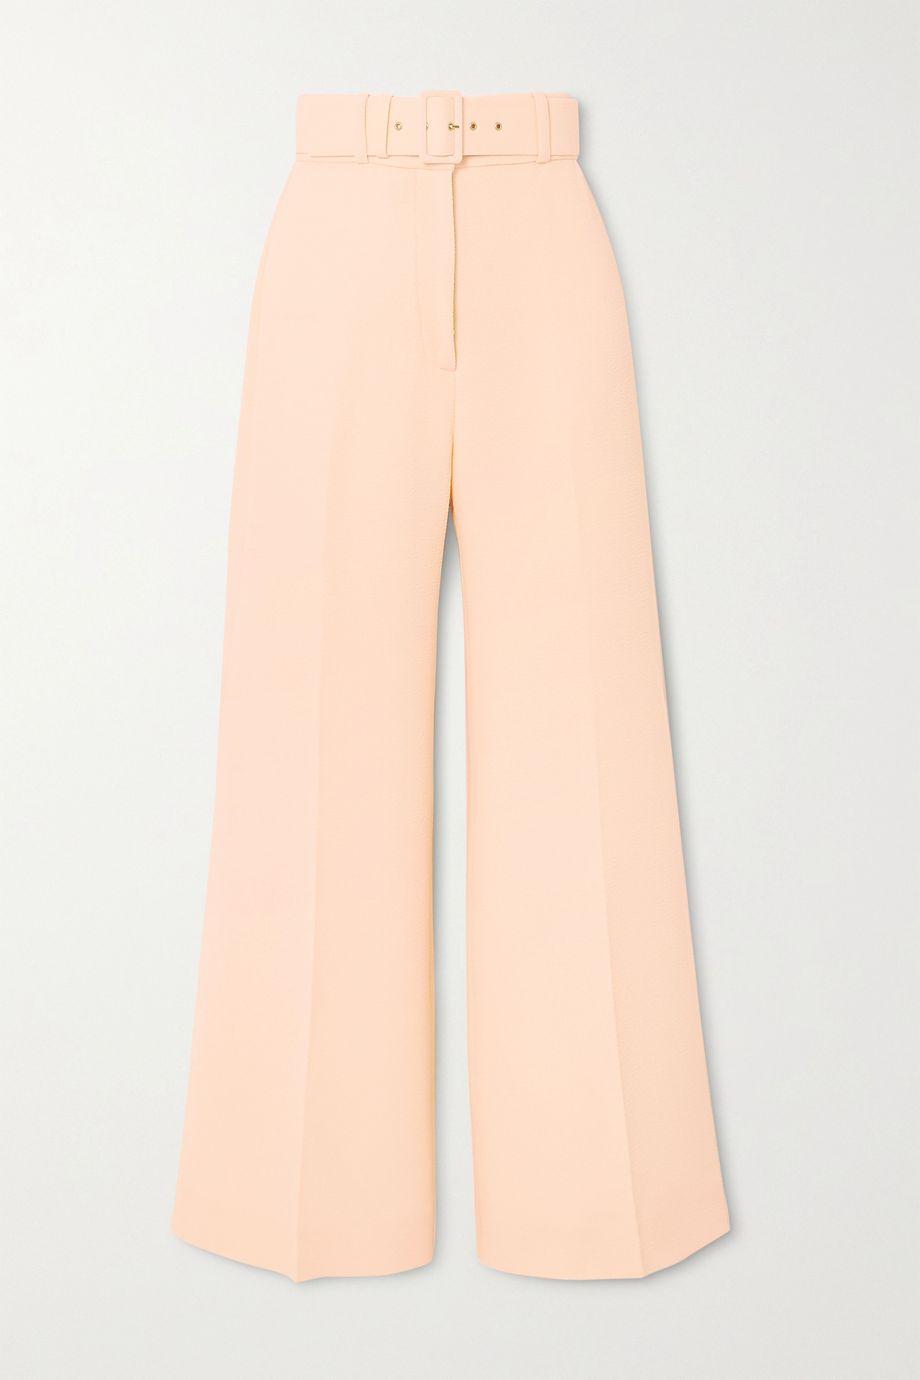 Emilia Wickstead Jana belted cloqué wide-leg pants